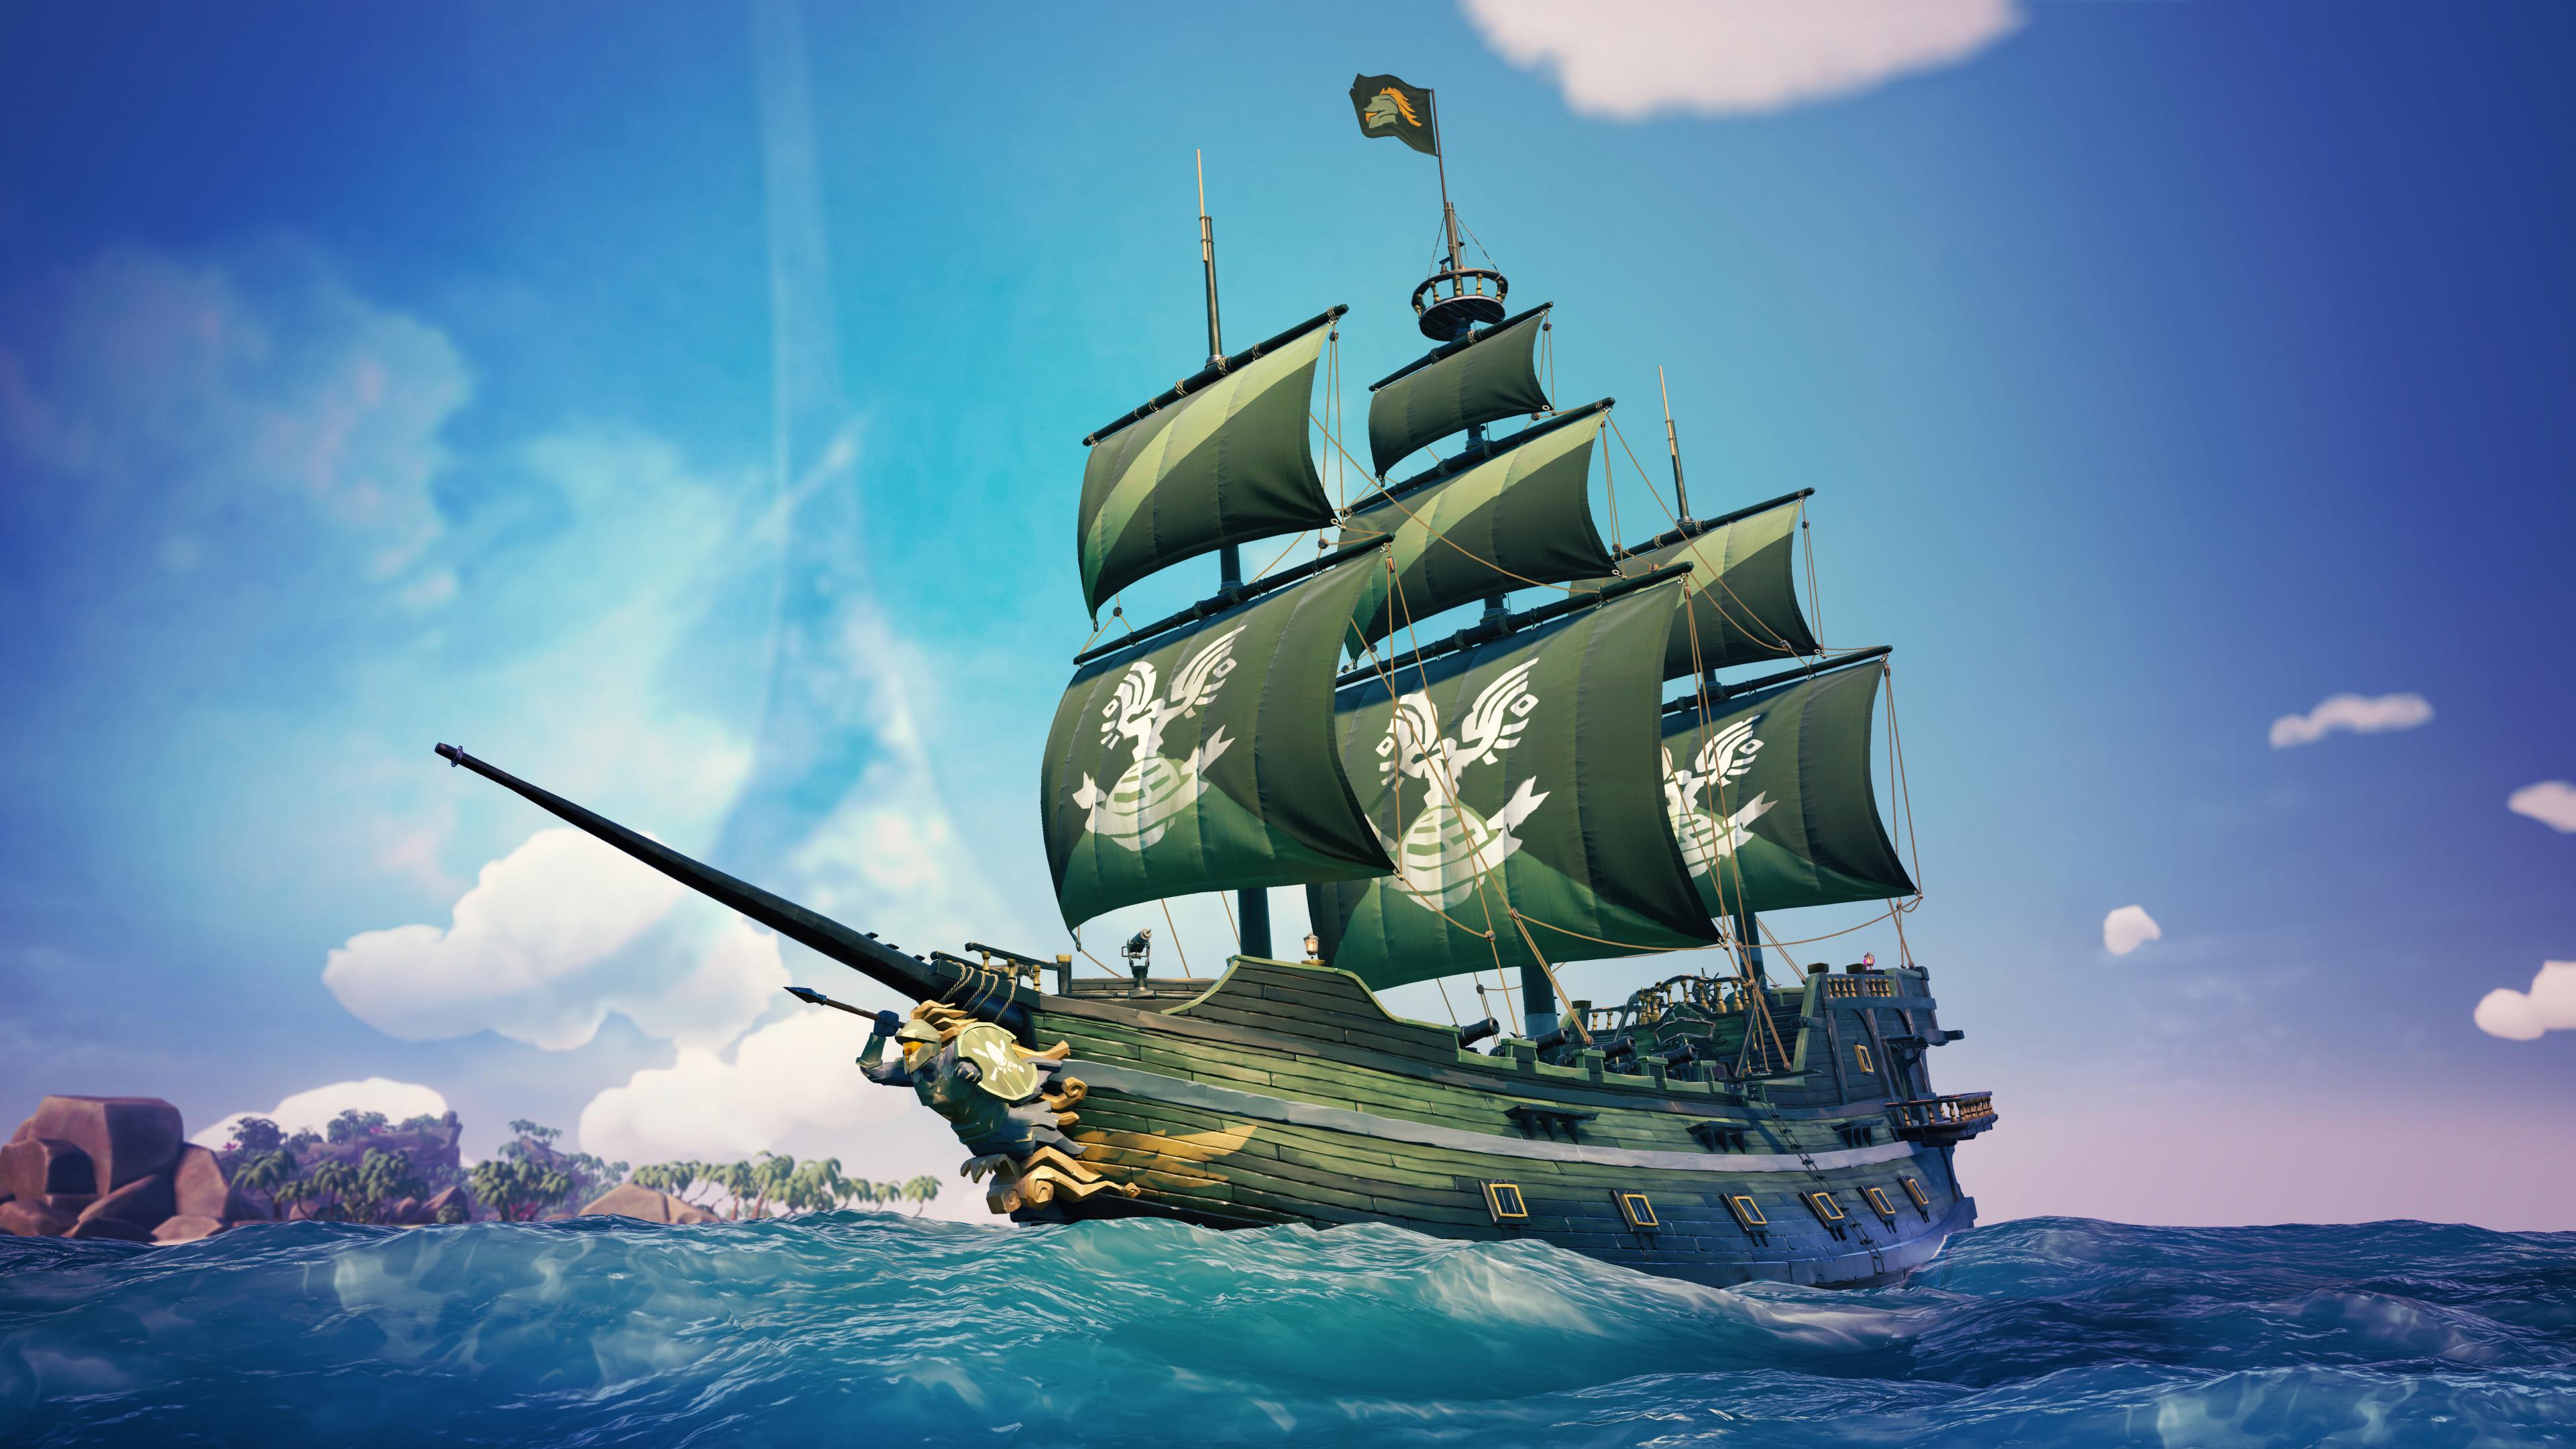 3840x2160 Halo Spartan Sea Of Thieves 4k Wallpaper Hd Games 4k